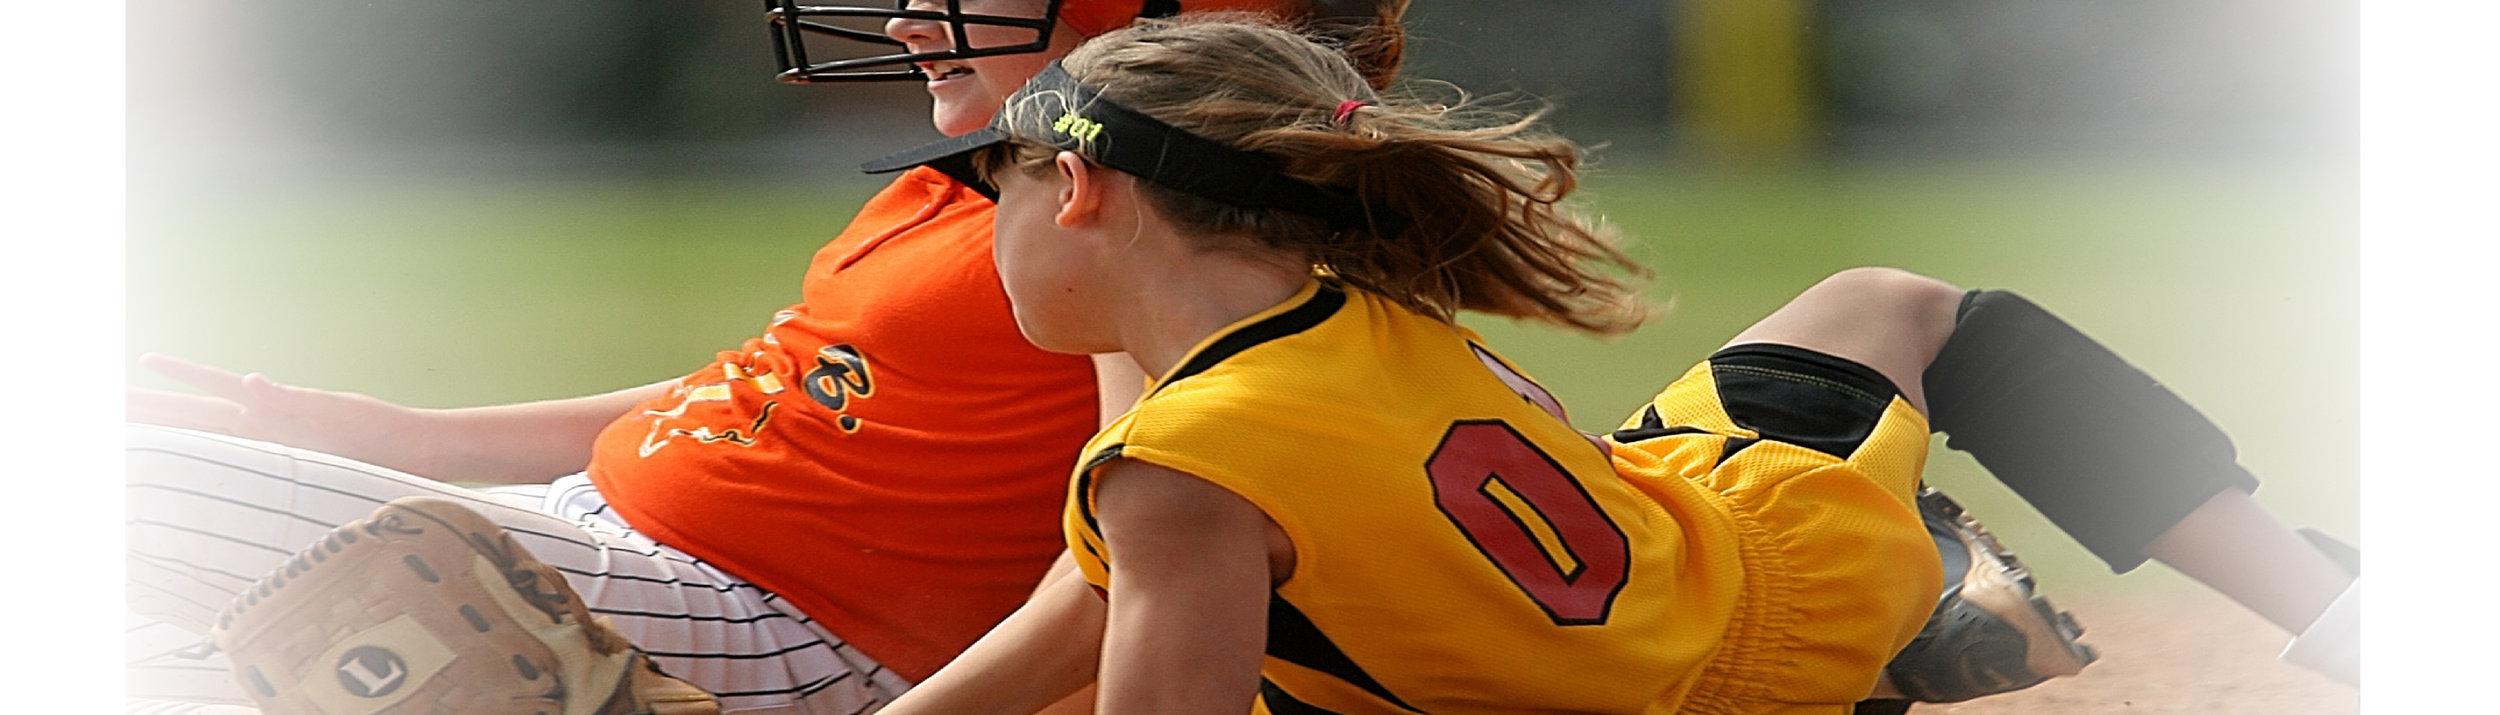 Home Page Pic Softball.JPG